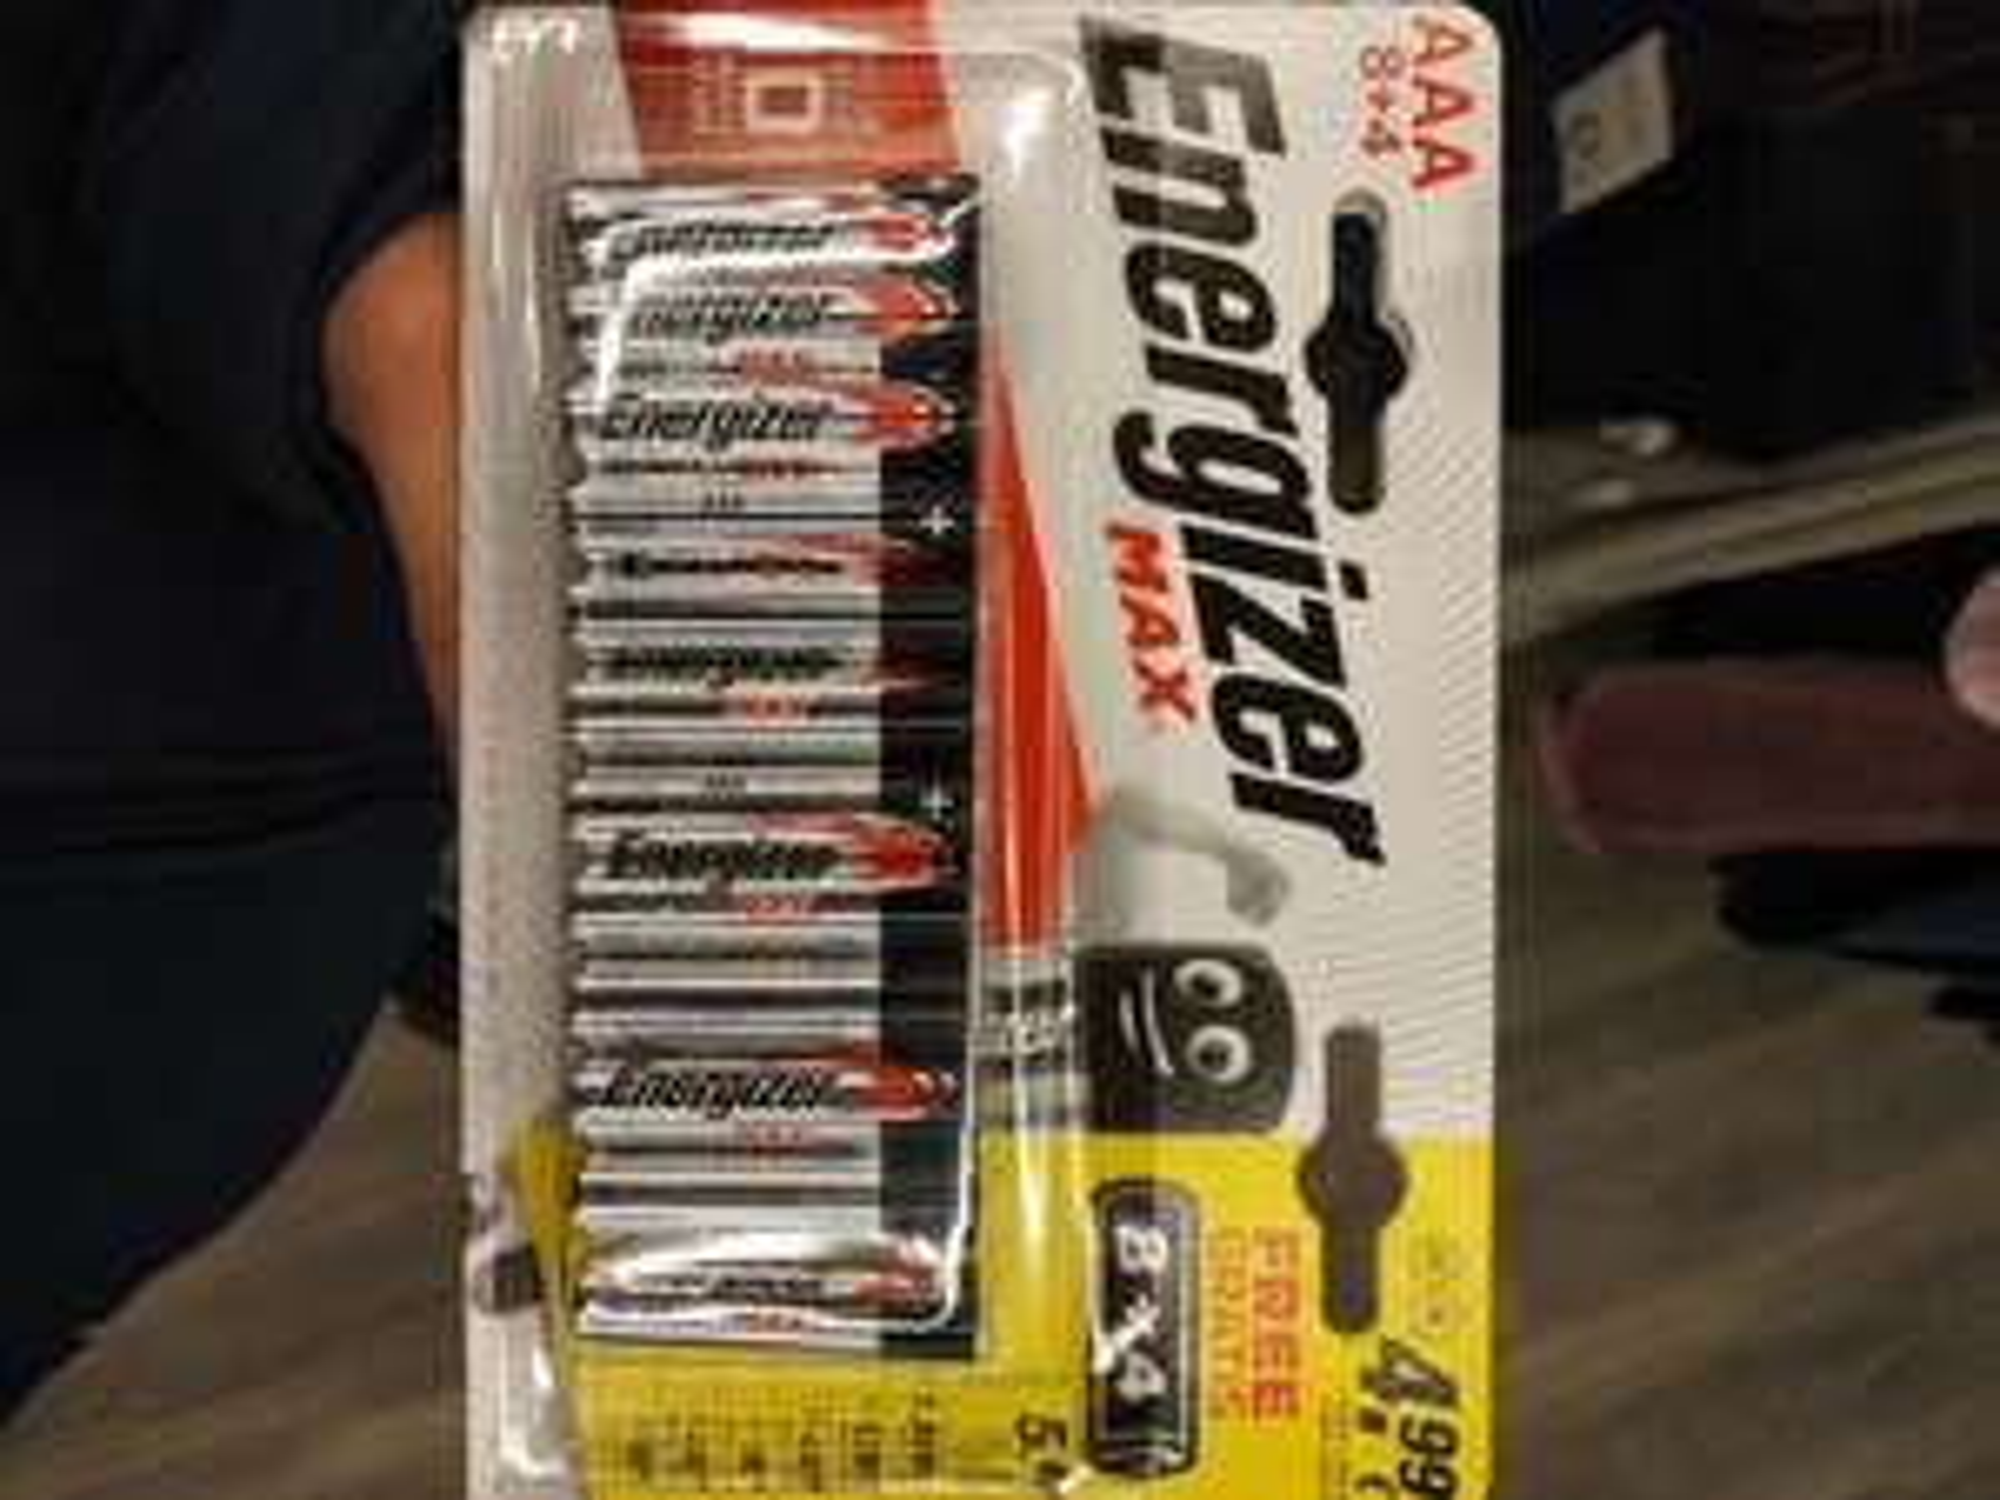 Baterie Energizer Max AA oraz AAA. 12 szt.